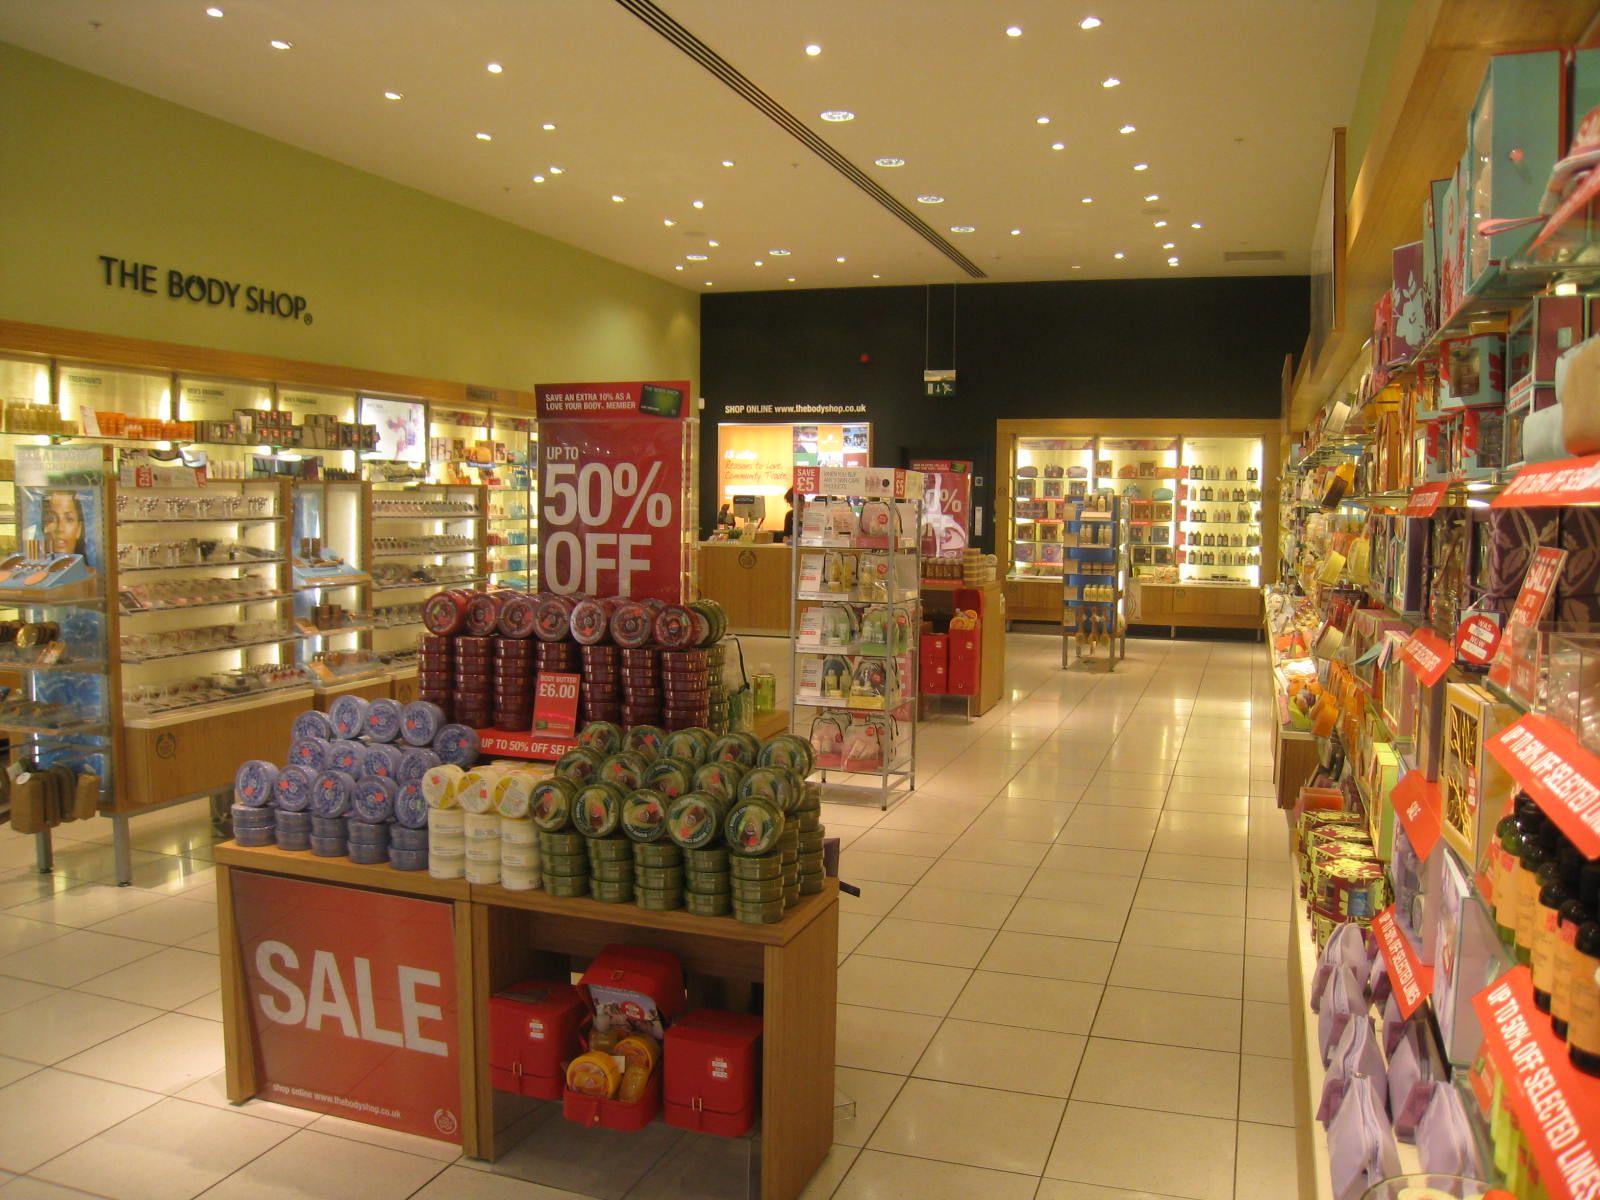 The Body Shop Interior Design Commercial Interiors Retail Pinterest Shop Interior Design